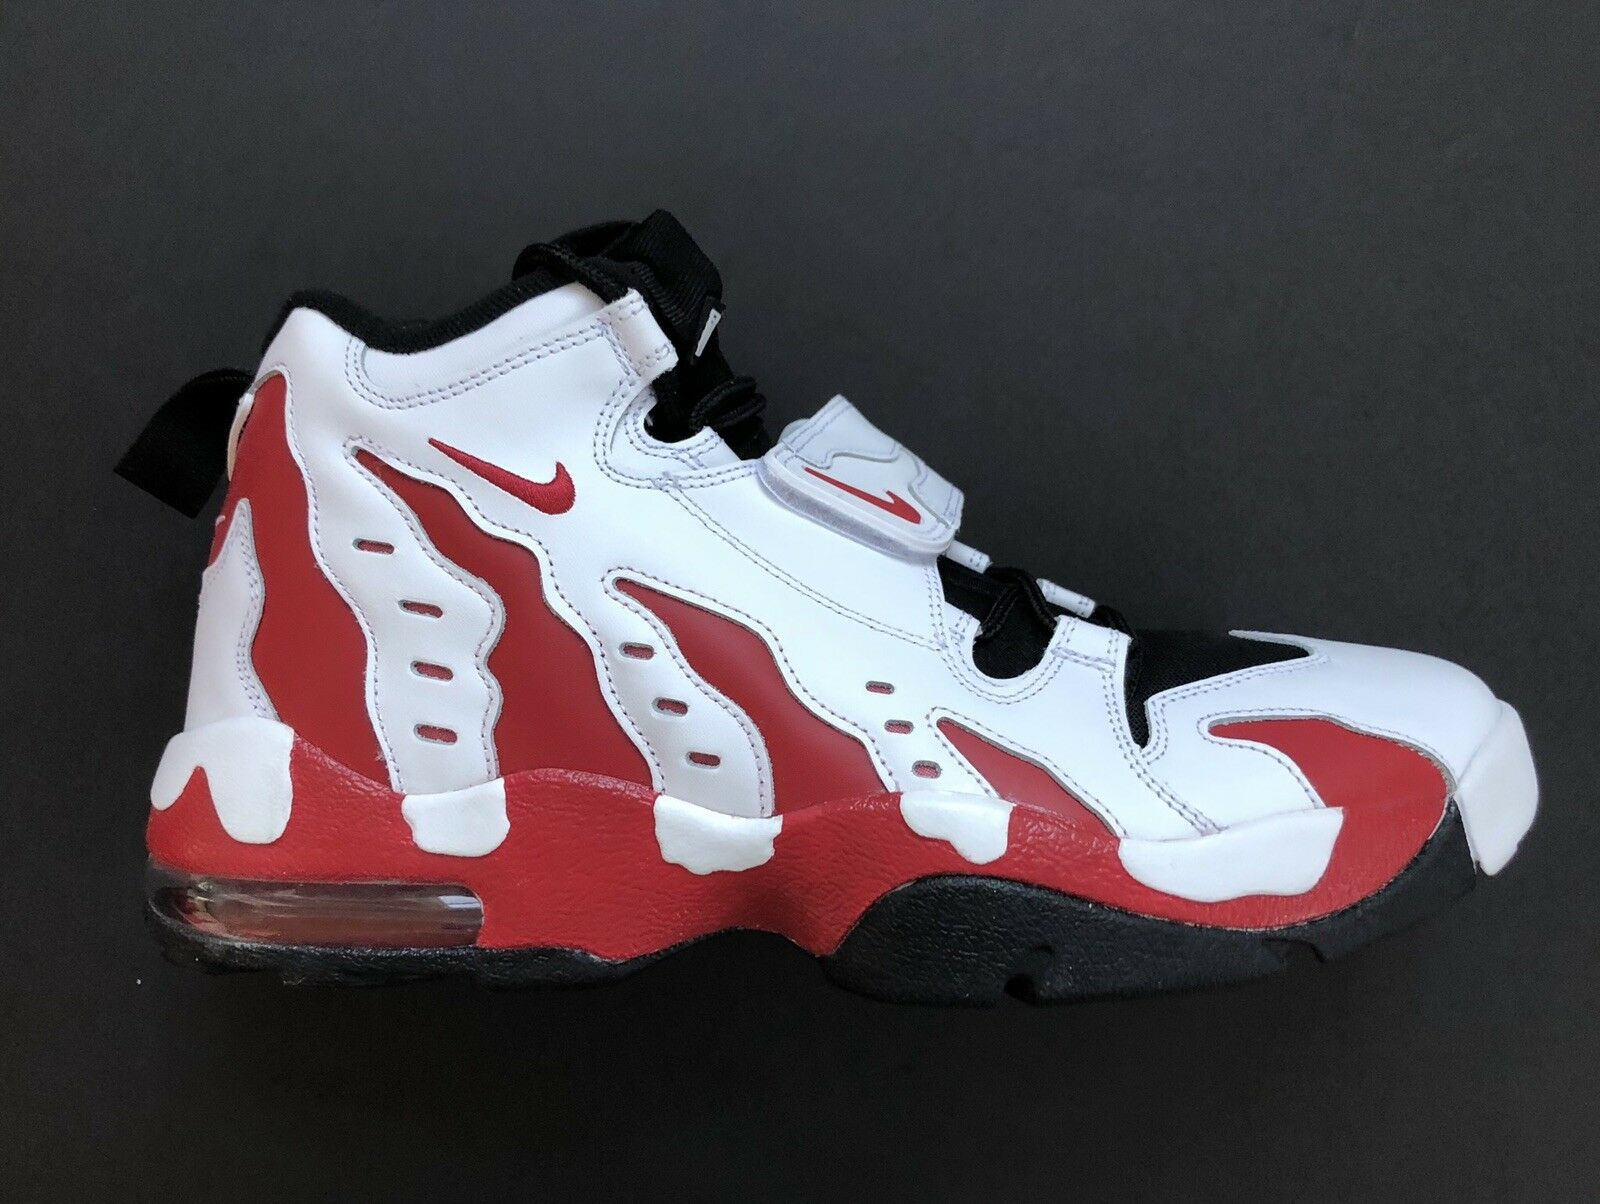 Nike Air Varsity 11 Größe 316408 161 Falcons rot Sanders